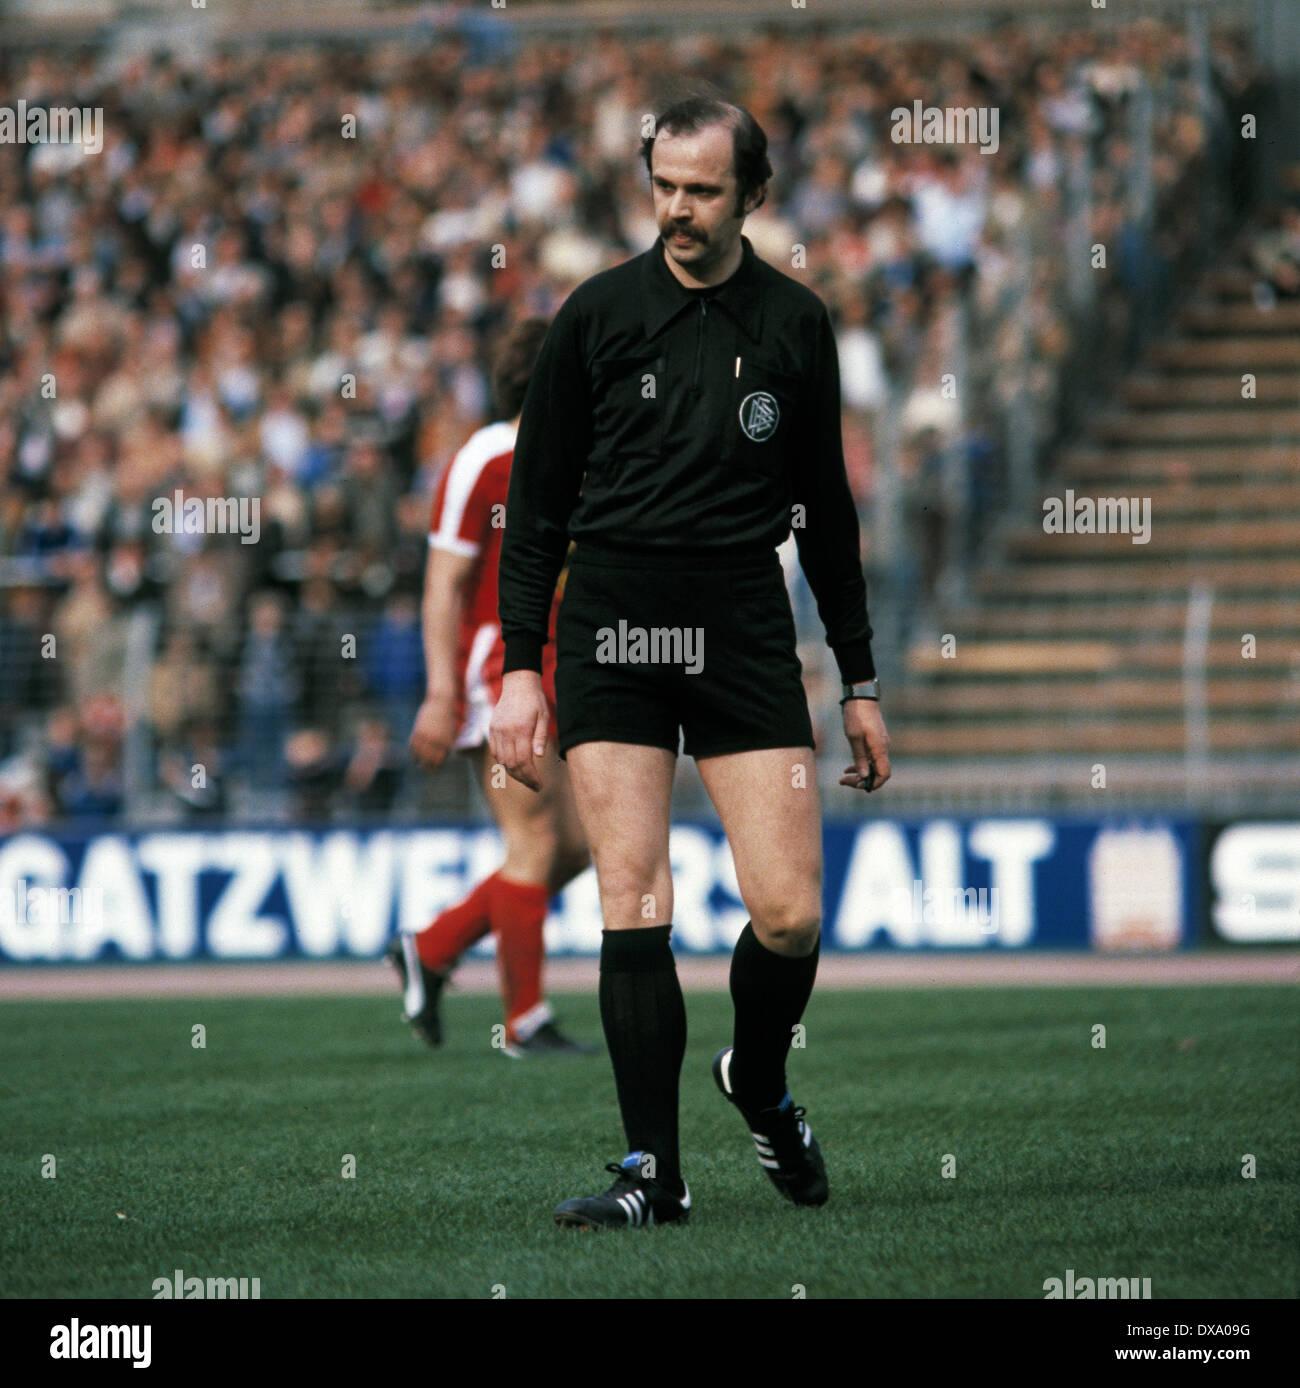 football, Bundesliga, 1980/1981, Rhine Stadium, Fortuna Duesseldorf versus VfB Stuttgart 3:1, scene of the match, referee Dieter Niebergall - Stock Image